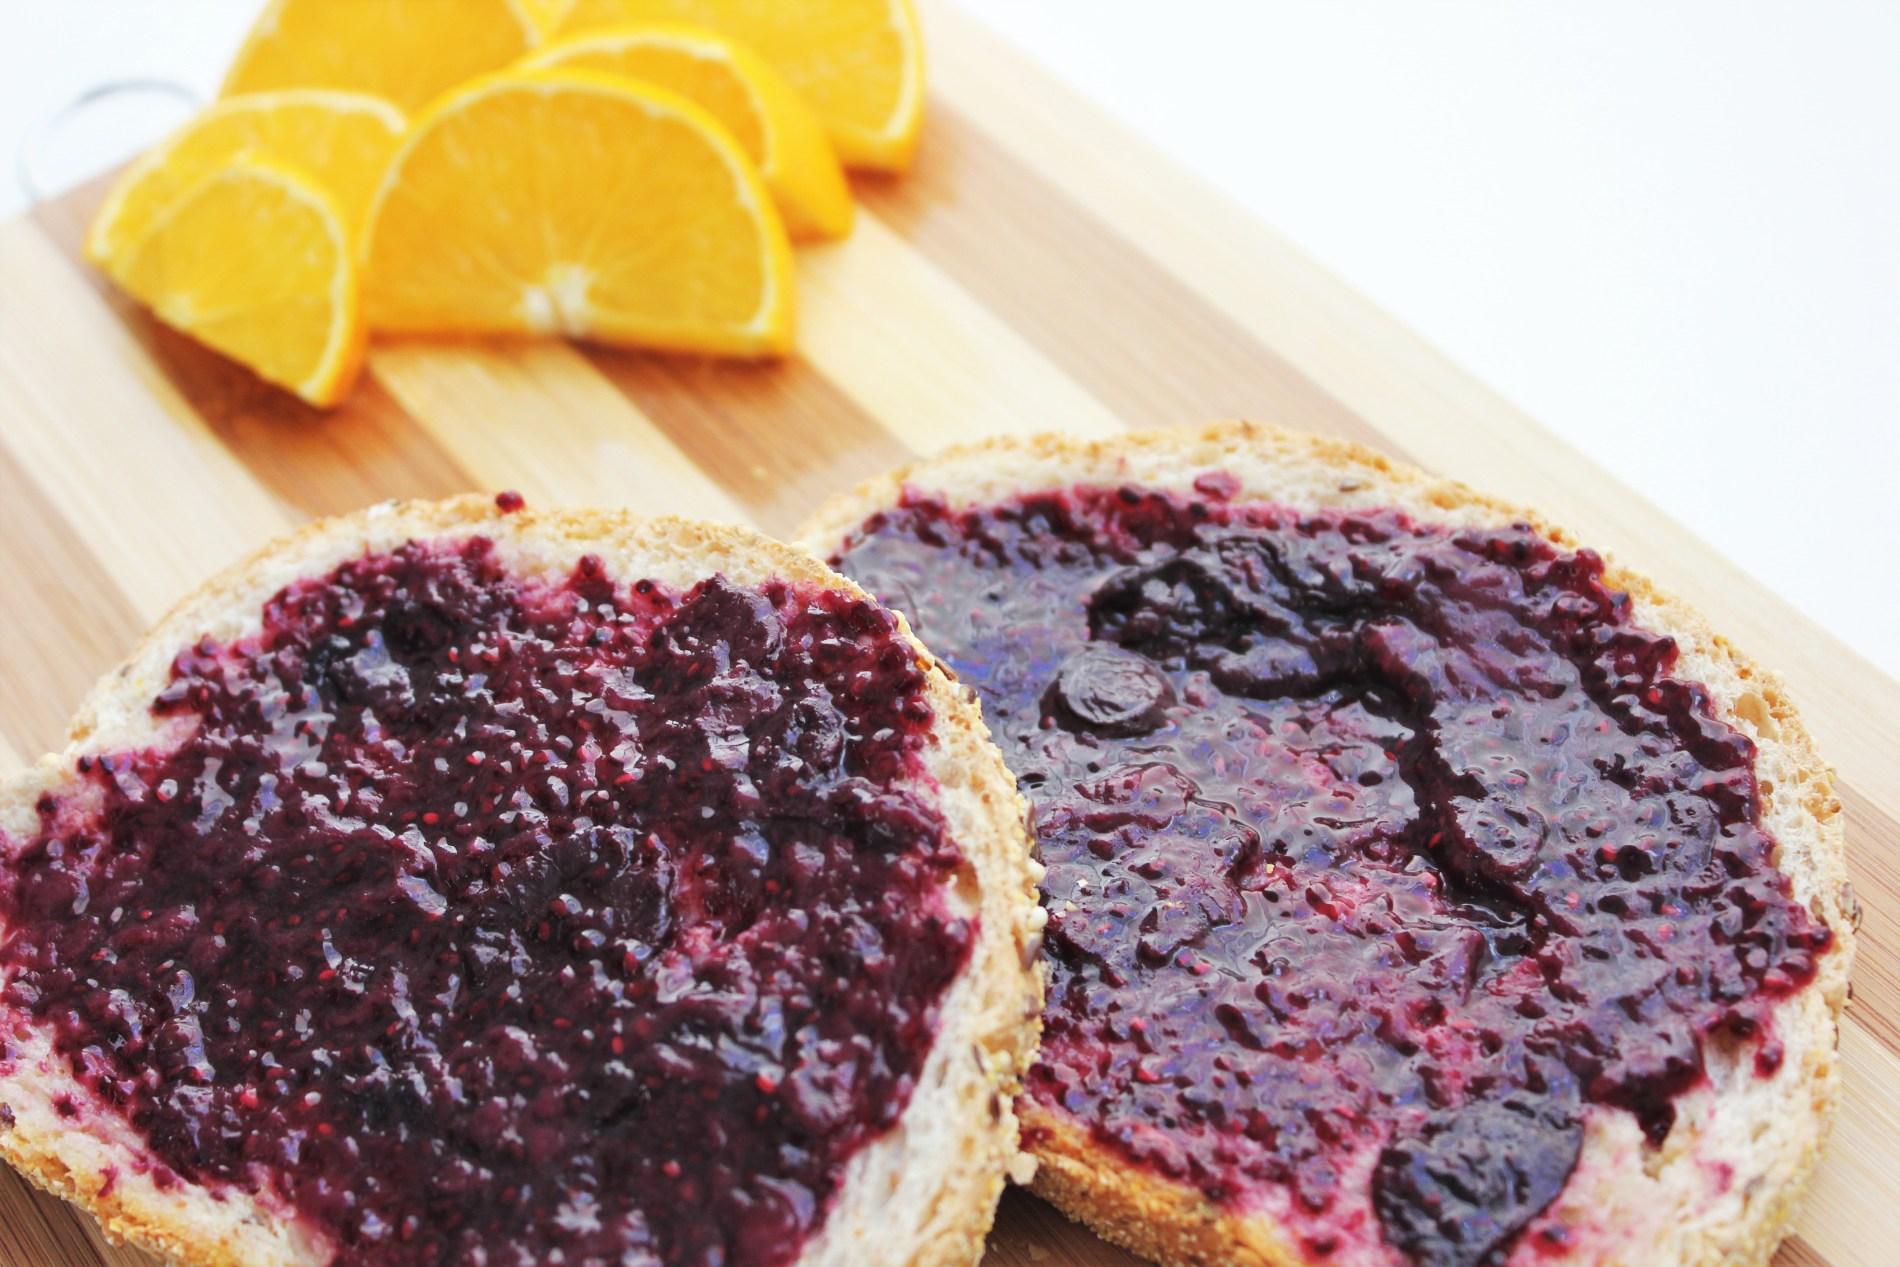 blueberry-&-strawberry-chia-seed-jam